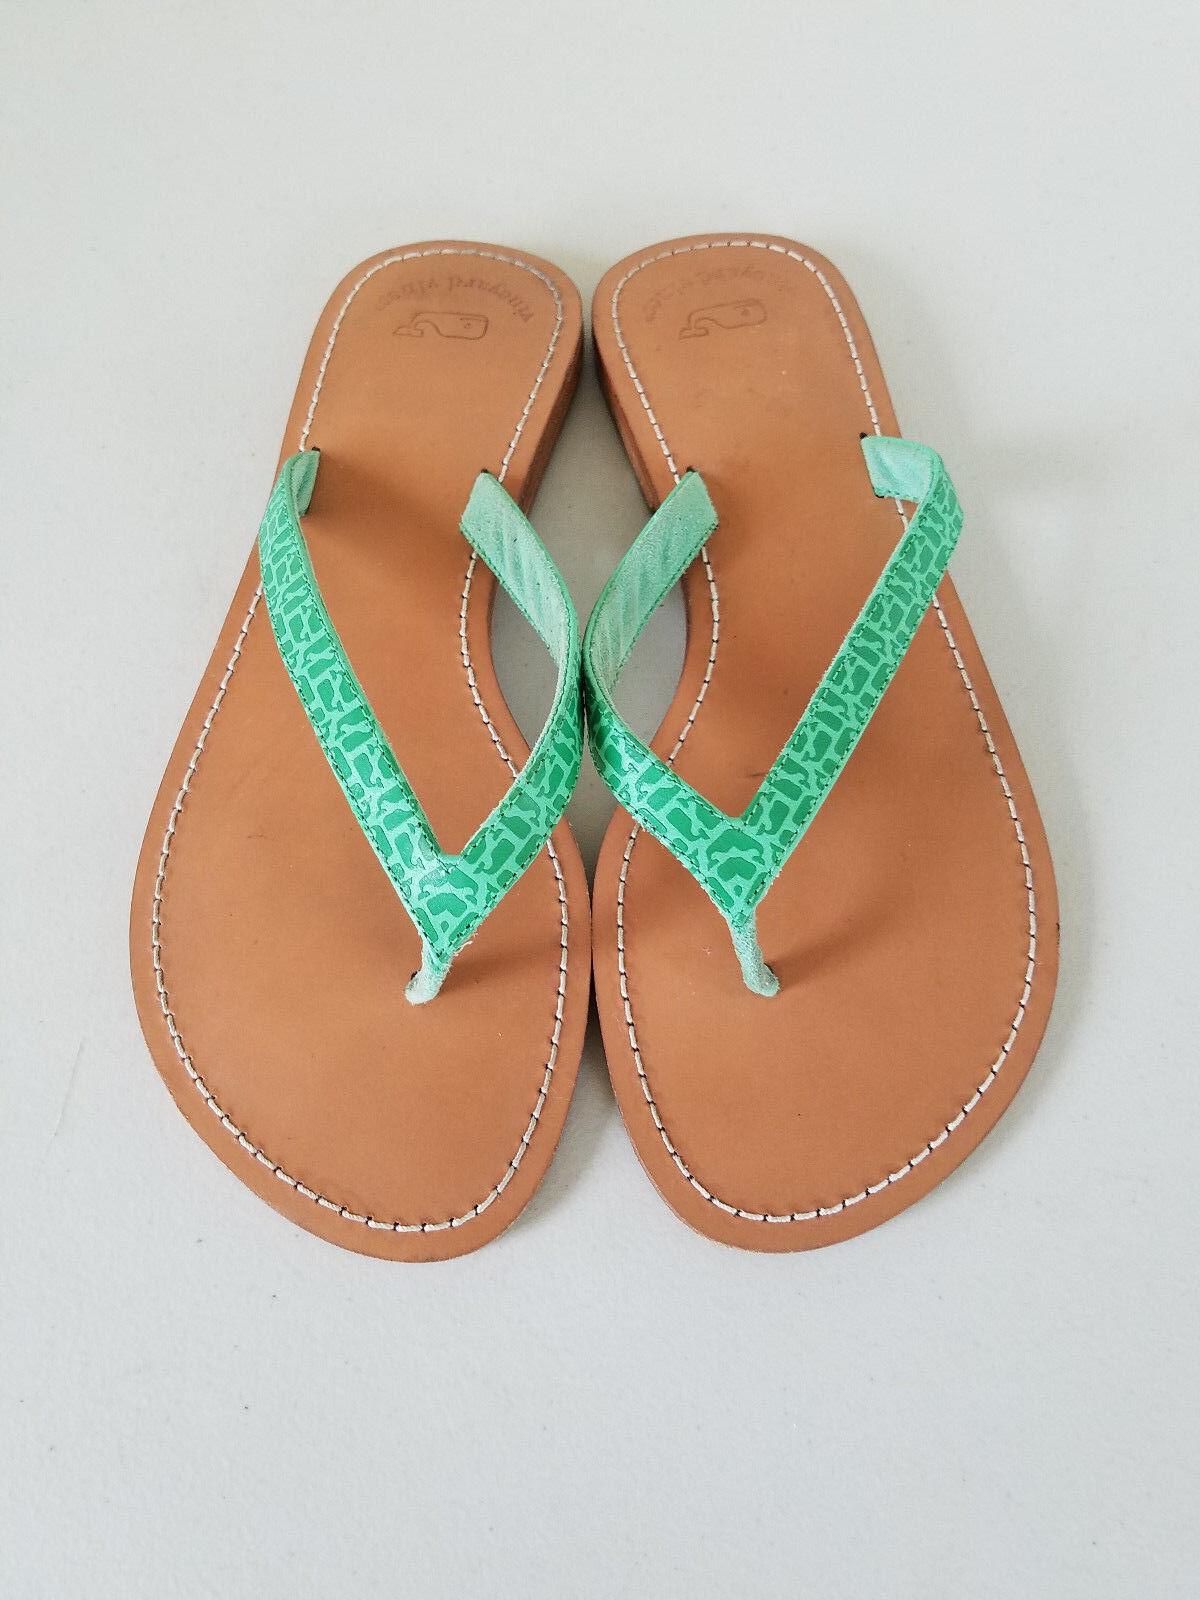 Vineyard Vines Flop Green Leather Flip Flop Vines Sandals Size 9 aac674